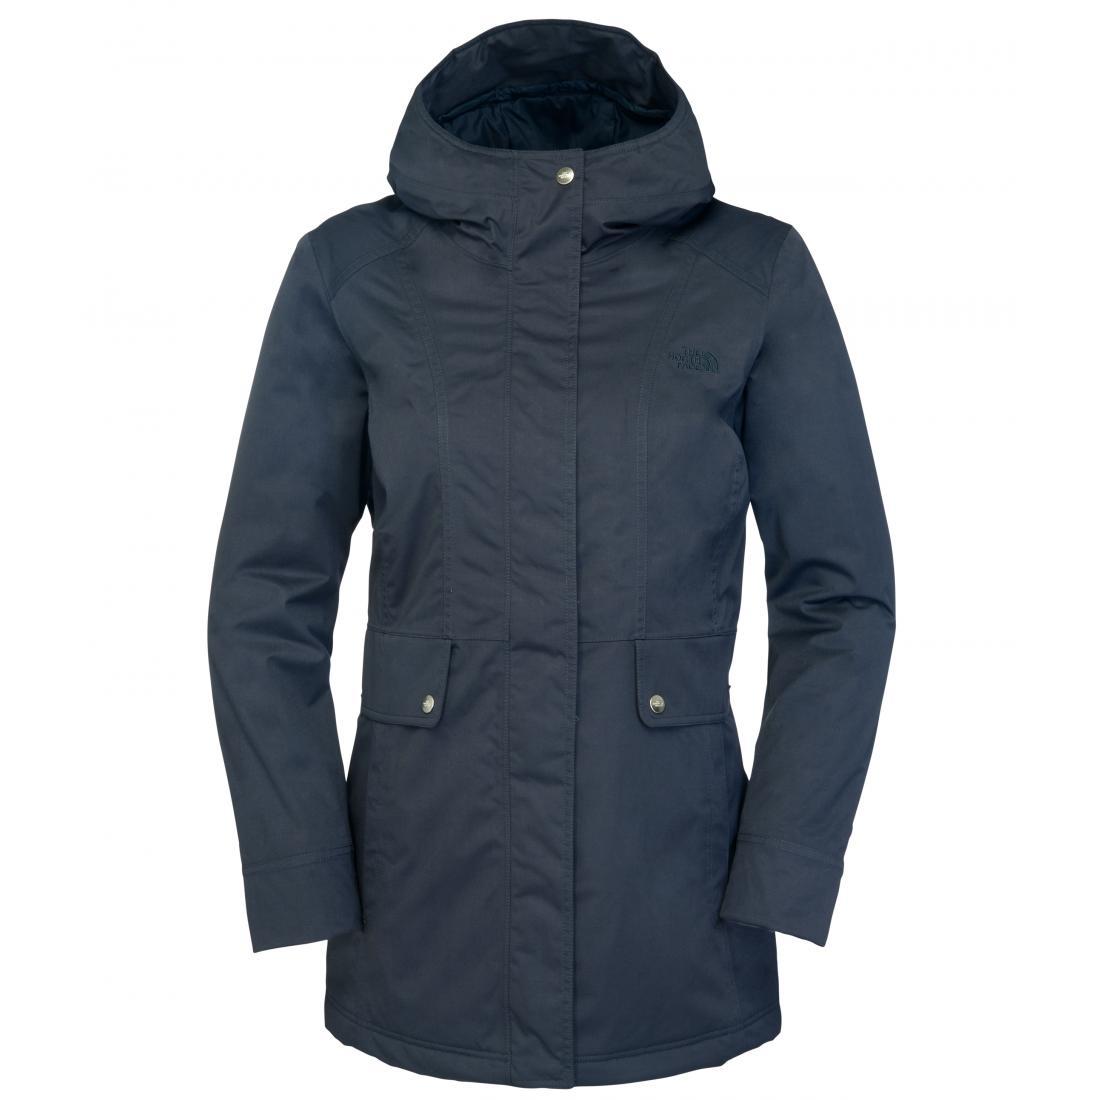 The North Face Winter Solstice Ladies Jacket | eBay